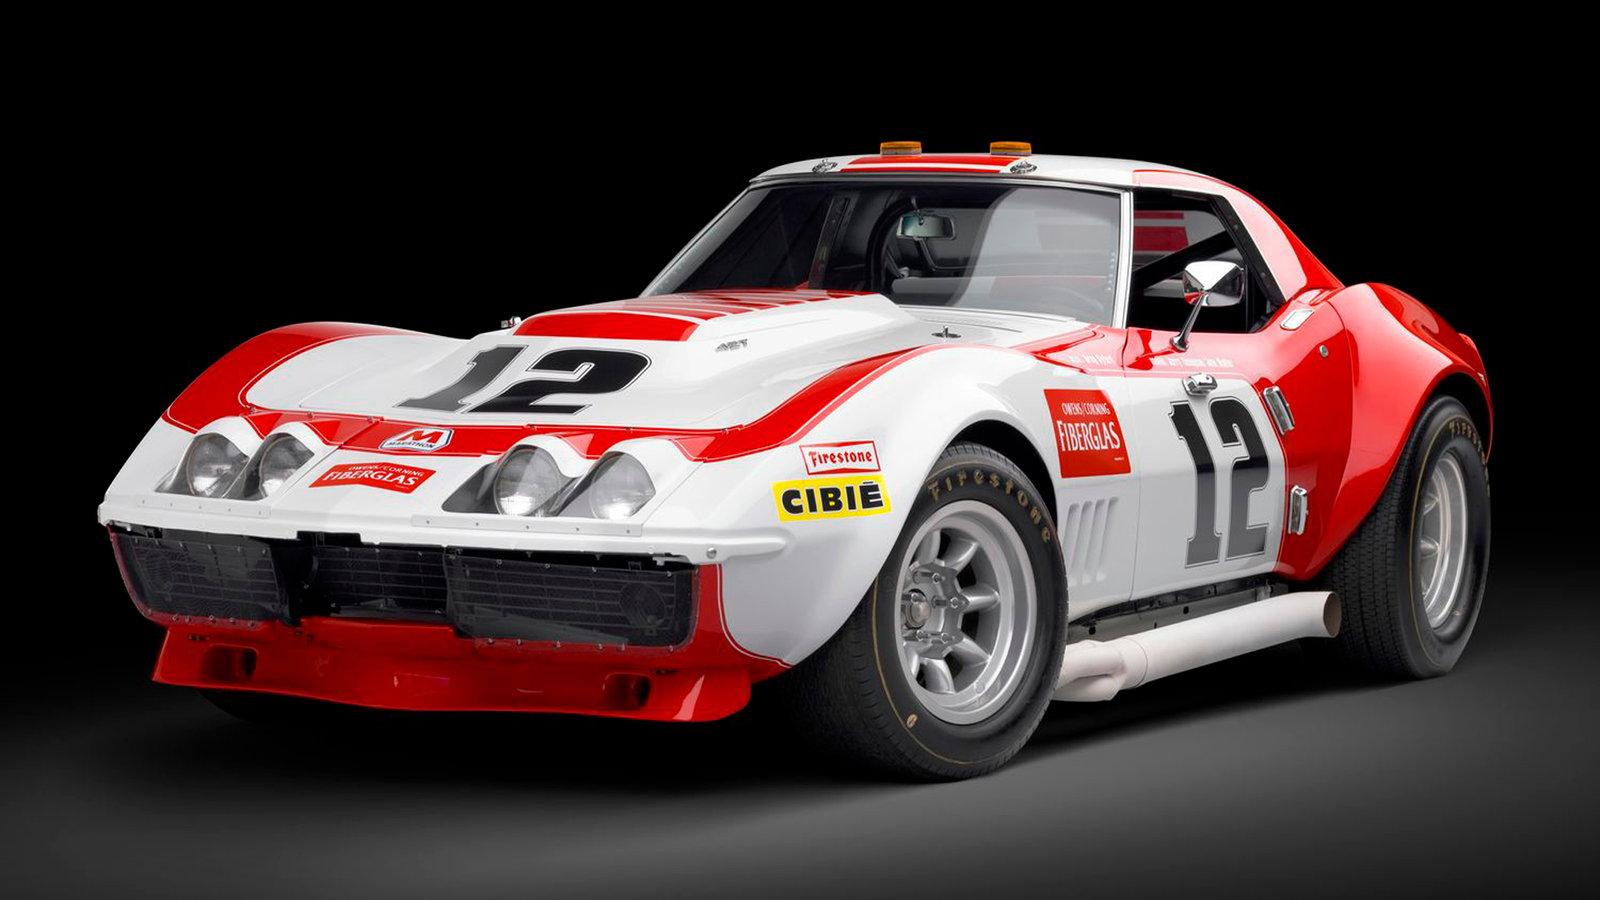 1968 Owens Corning Corvette